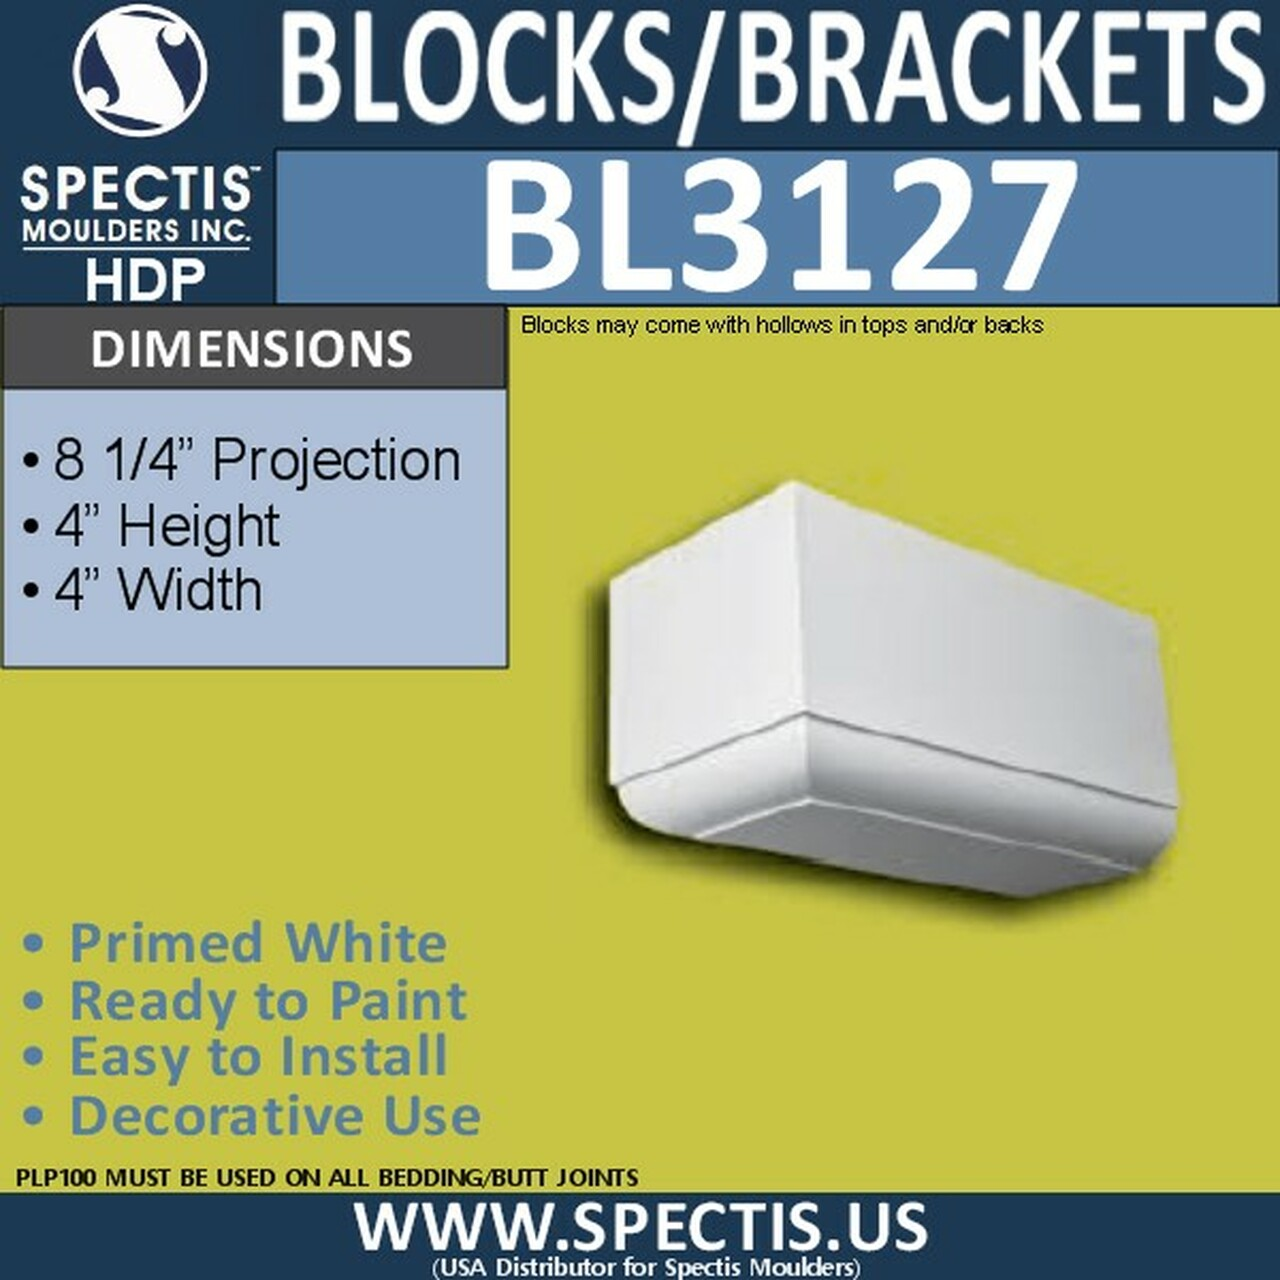 "BL3127 Eave Block or Bracket 4""W x 4""H x 8""P"